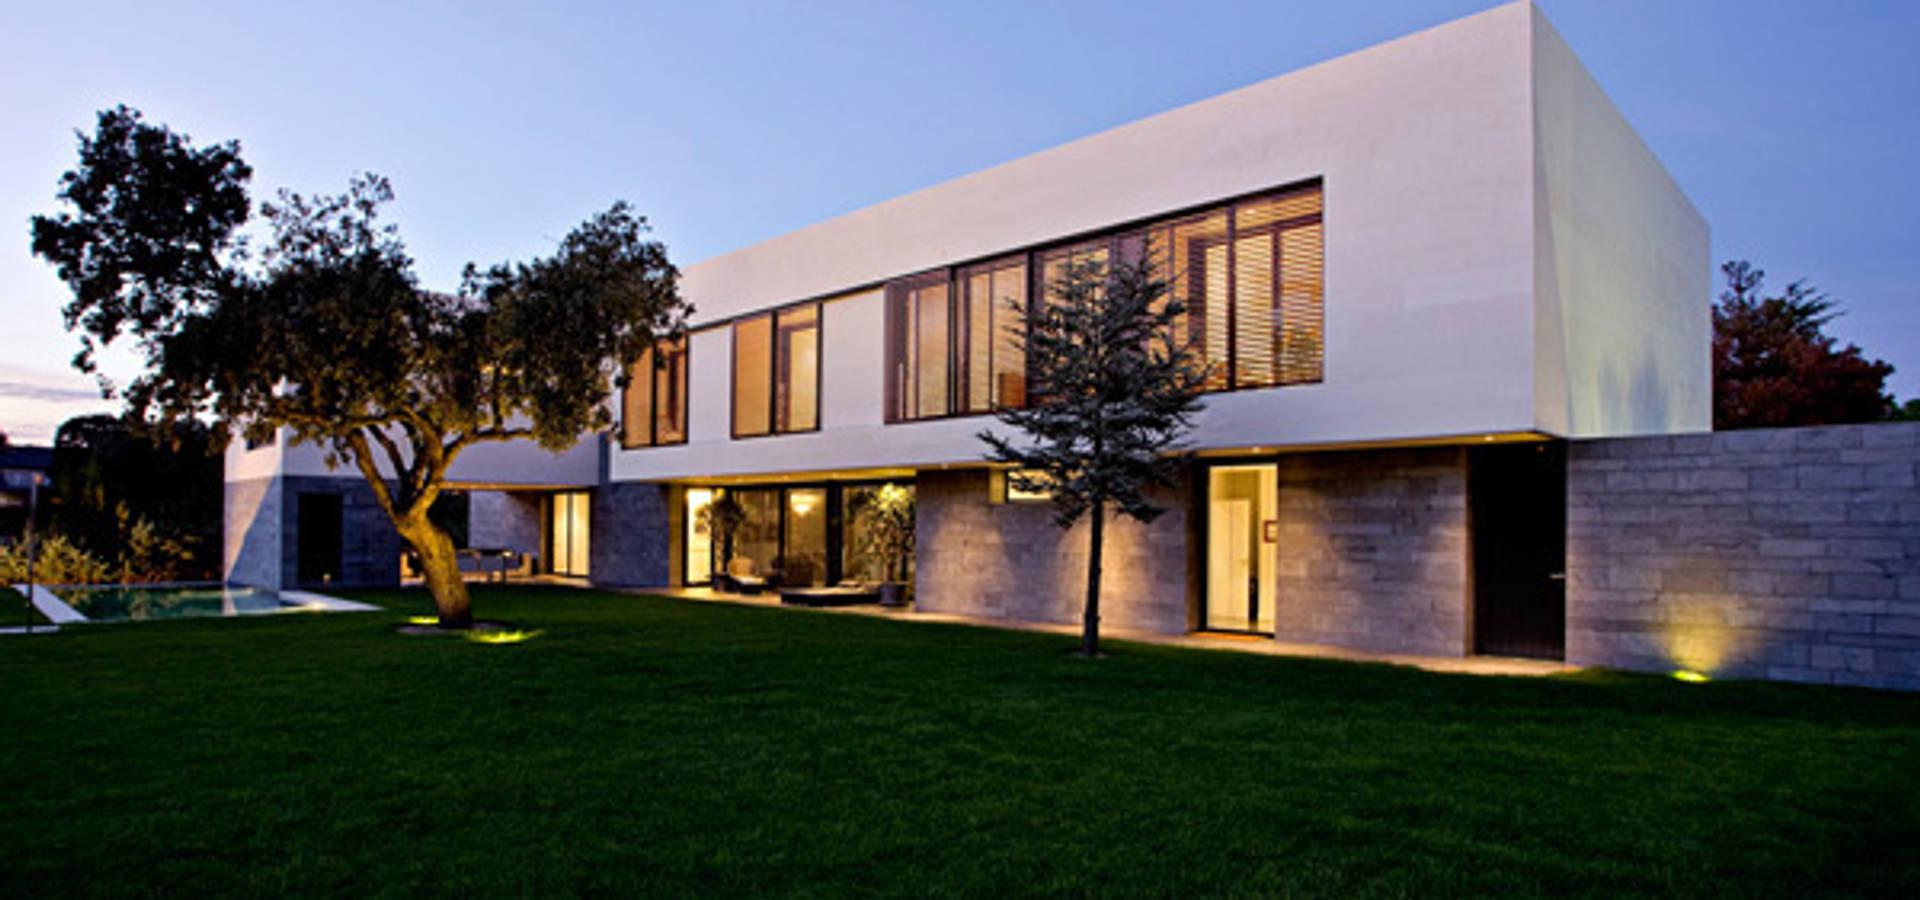 lightarchitecture studio